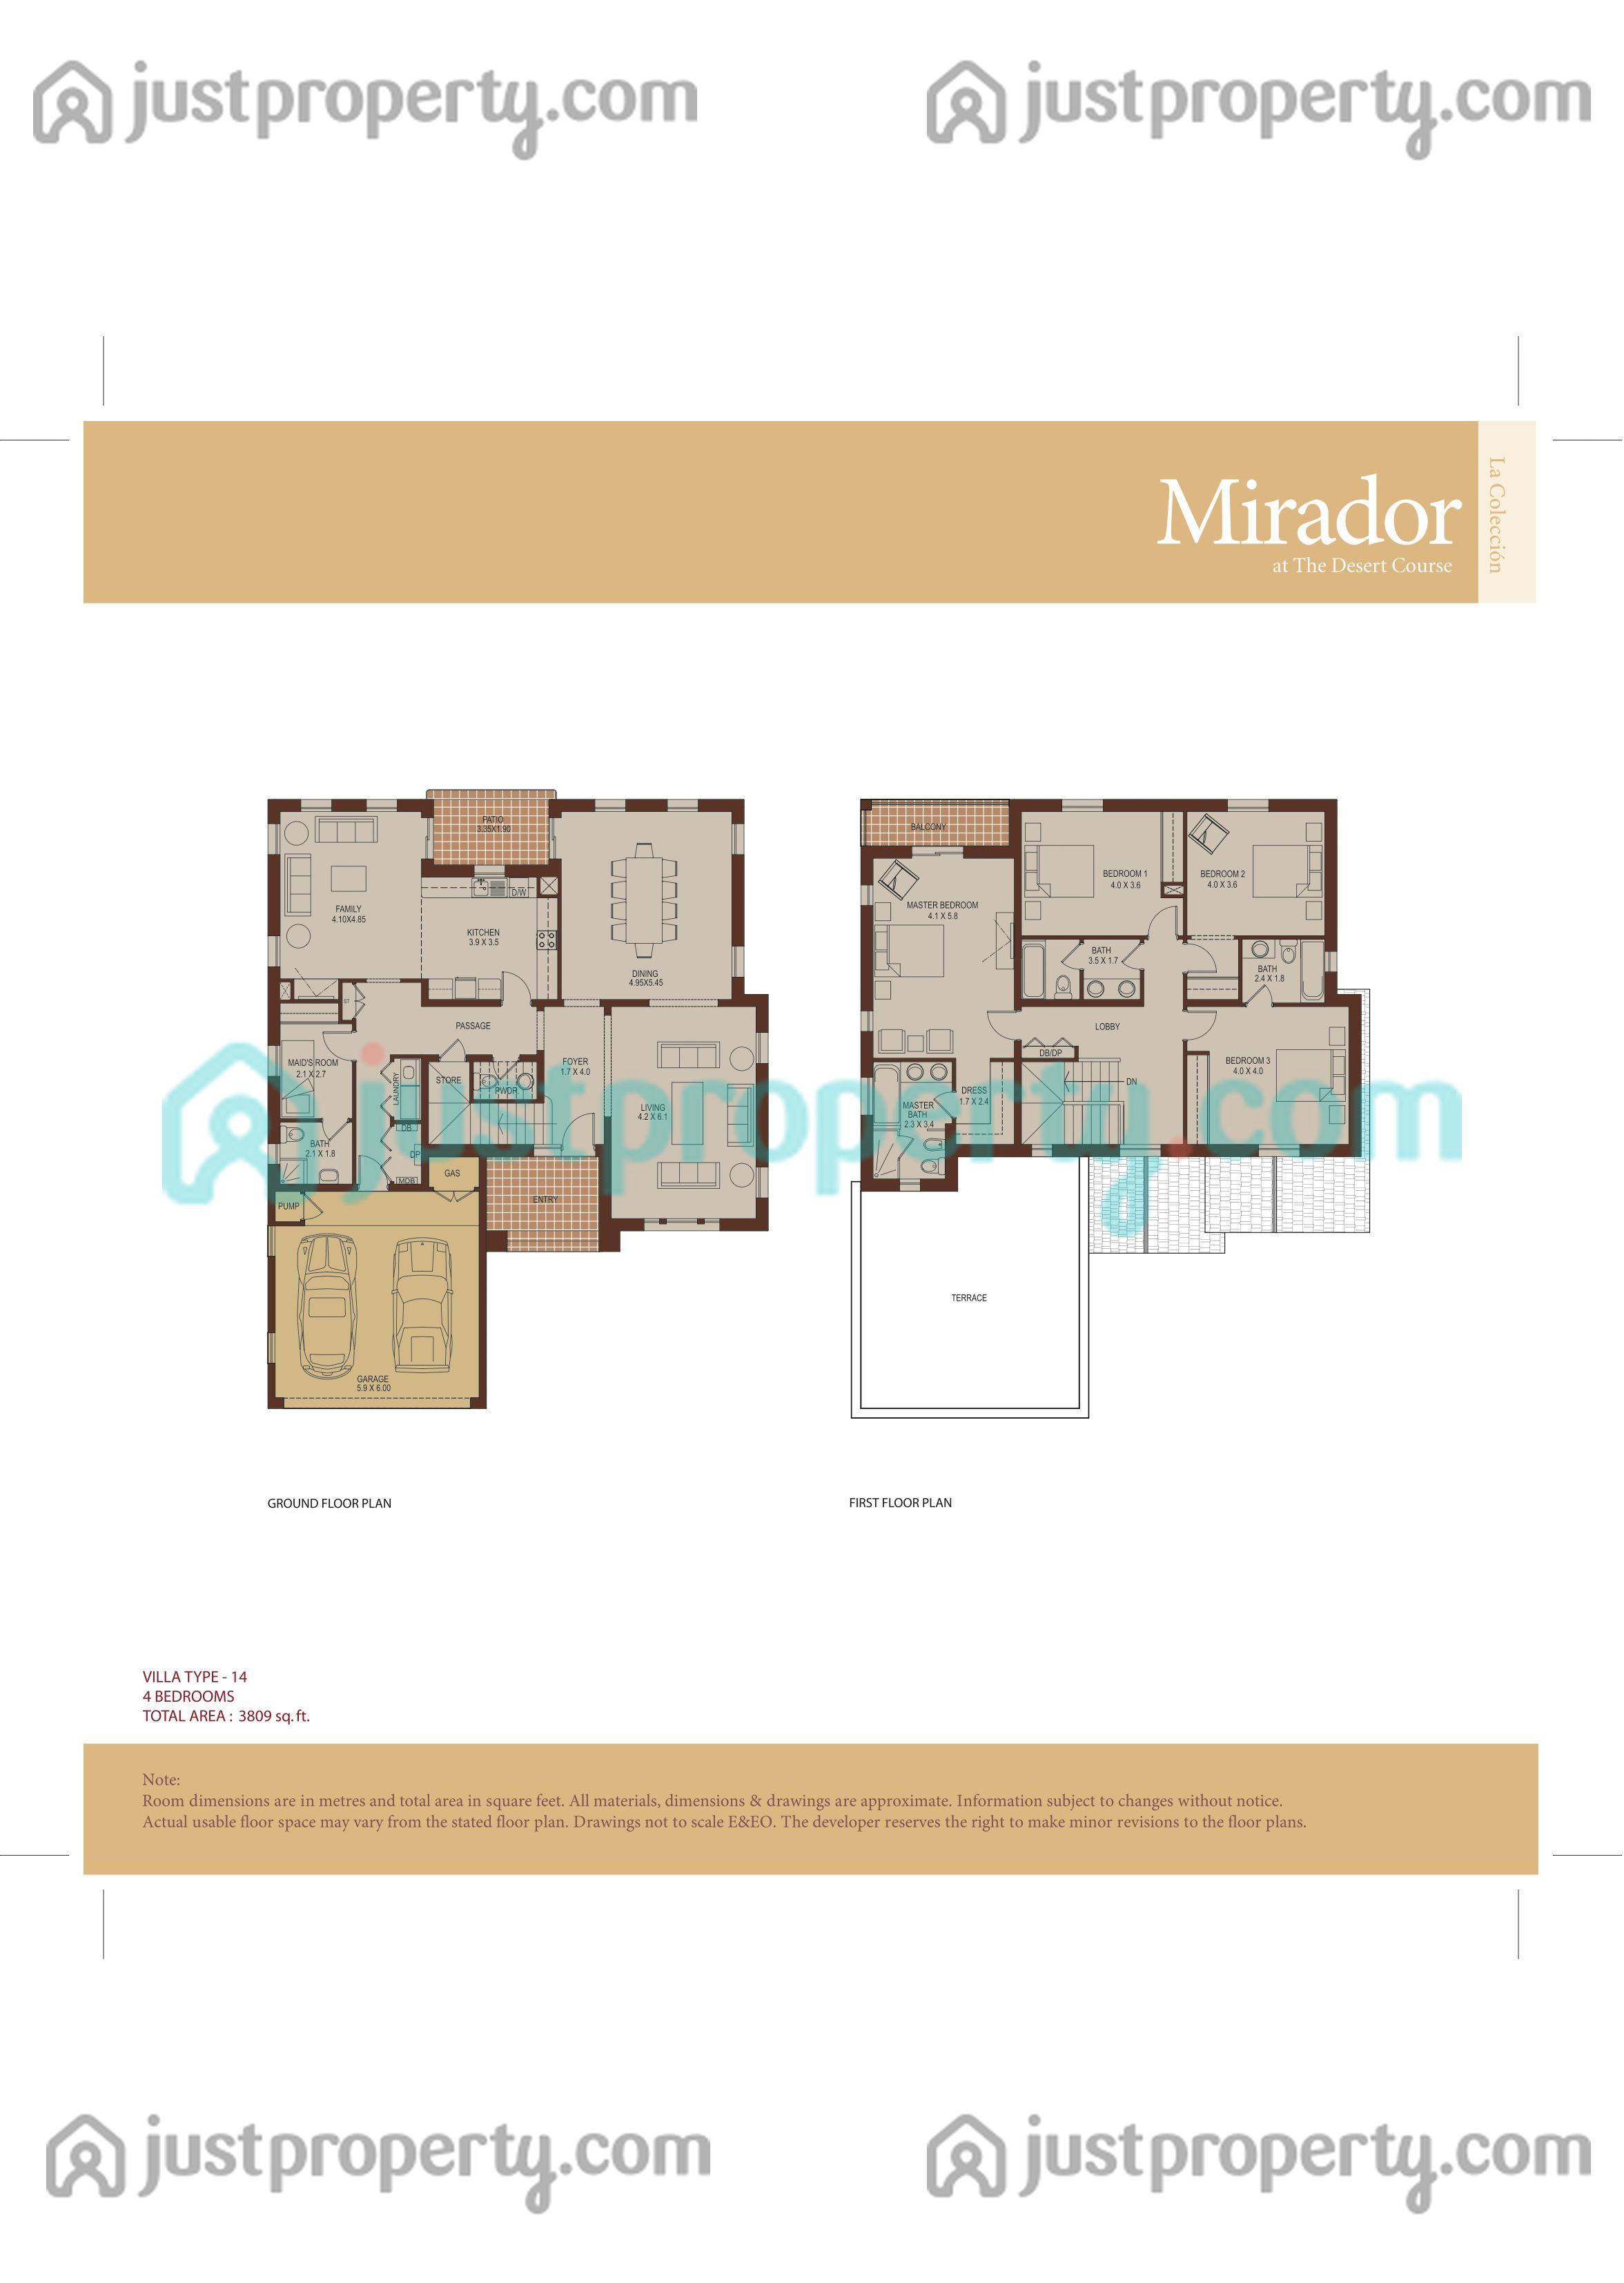 Mirador la coleccion floor plans for 5br house plans